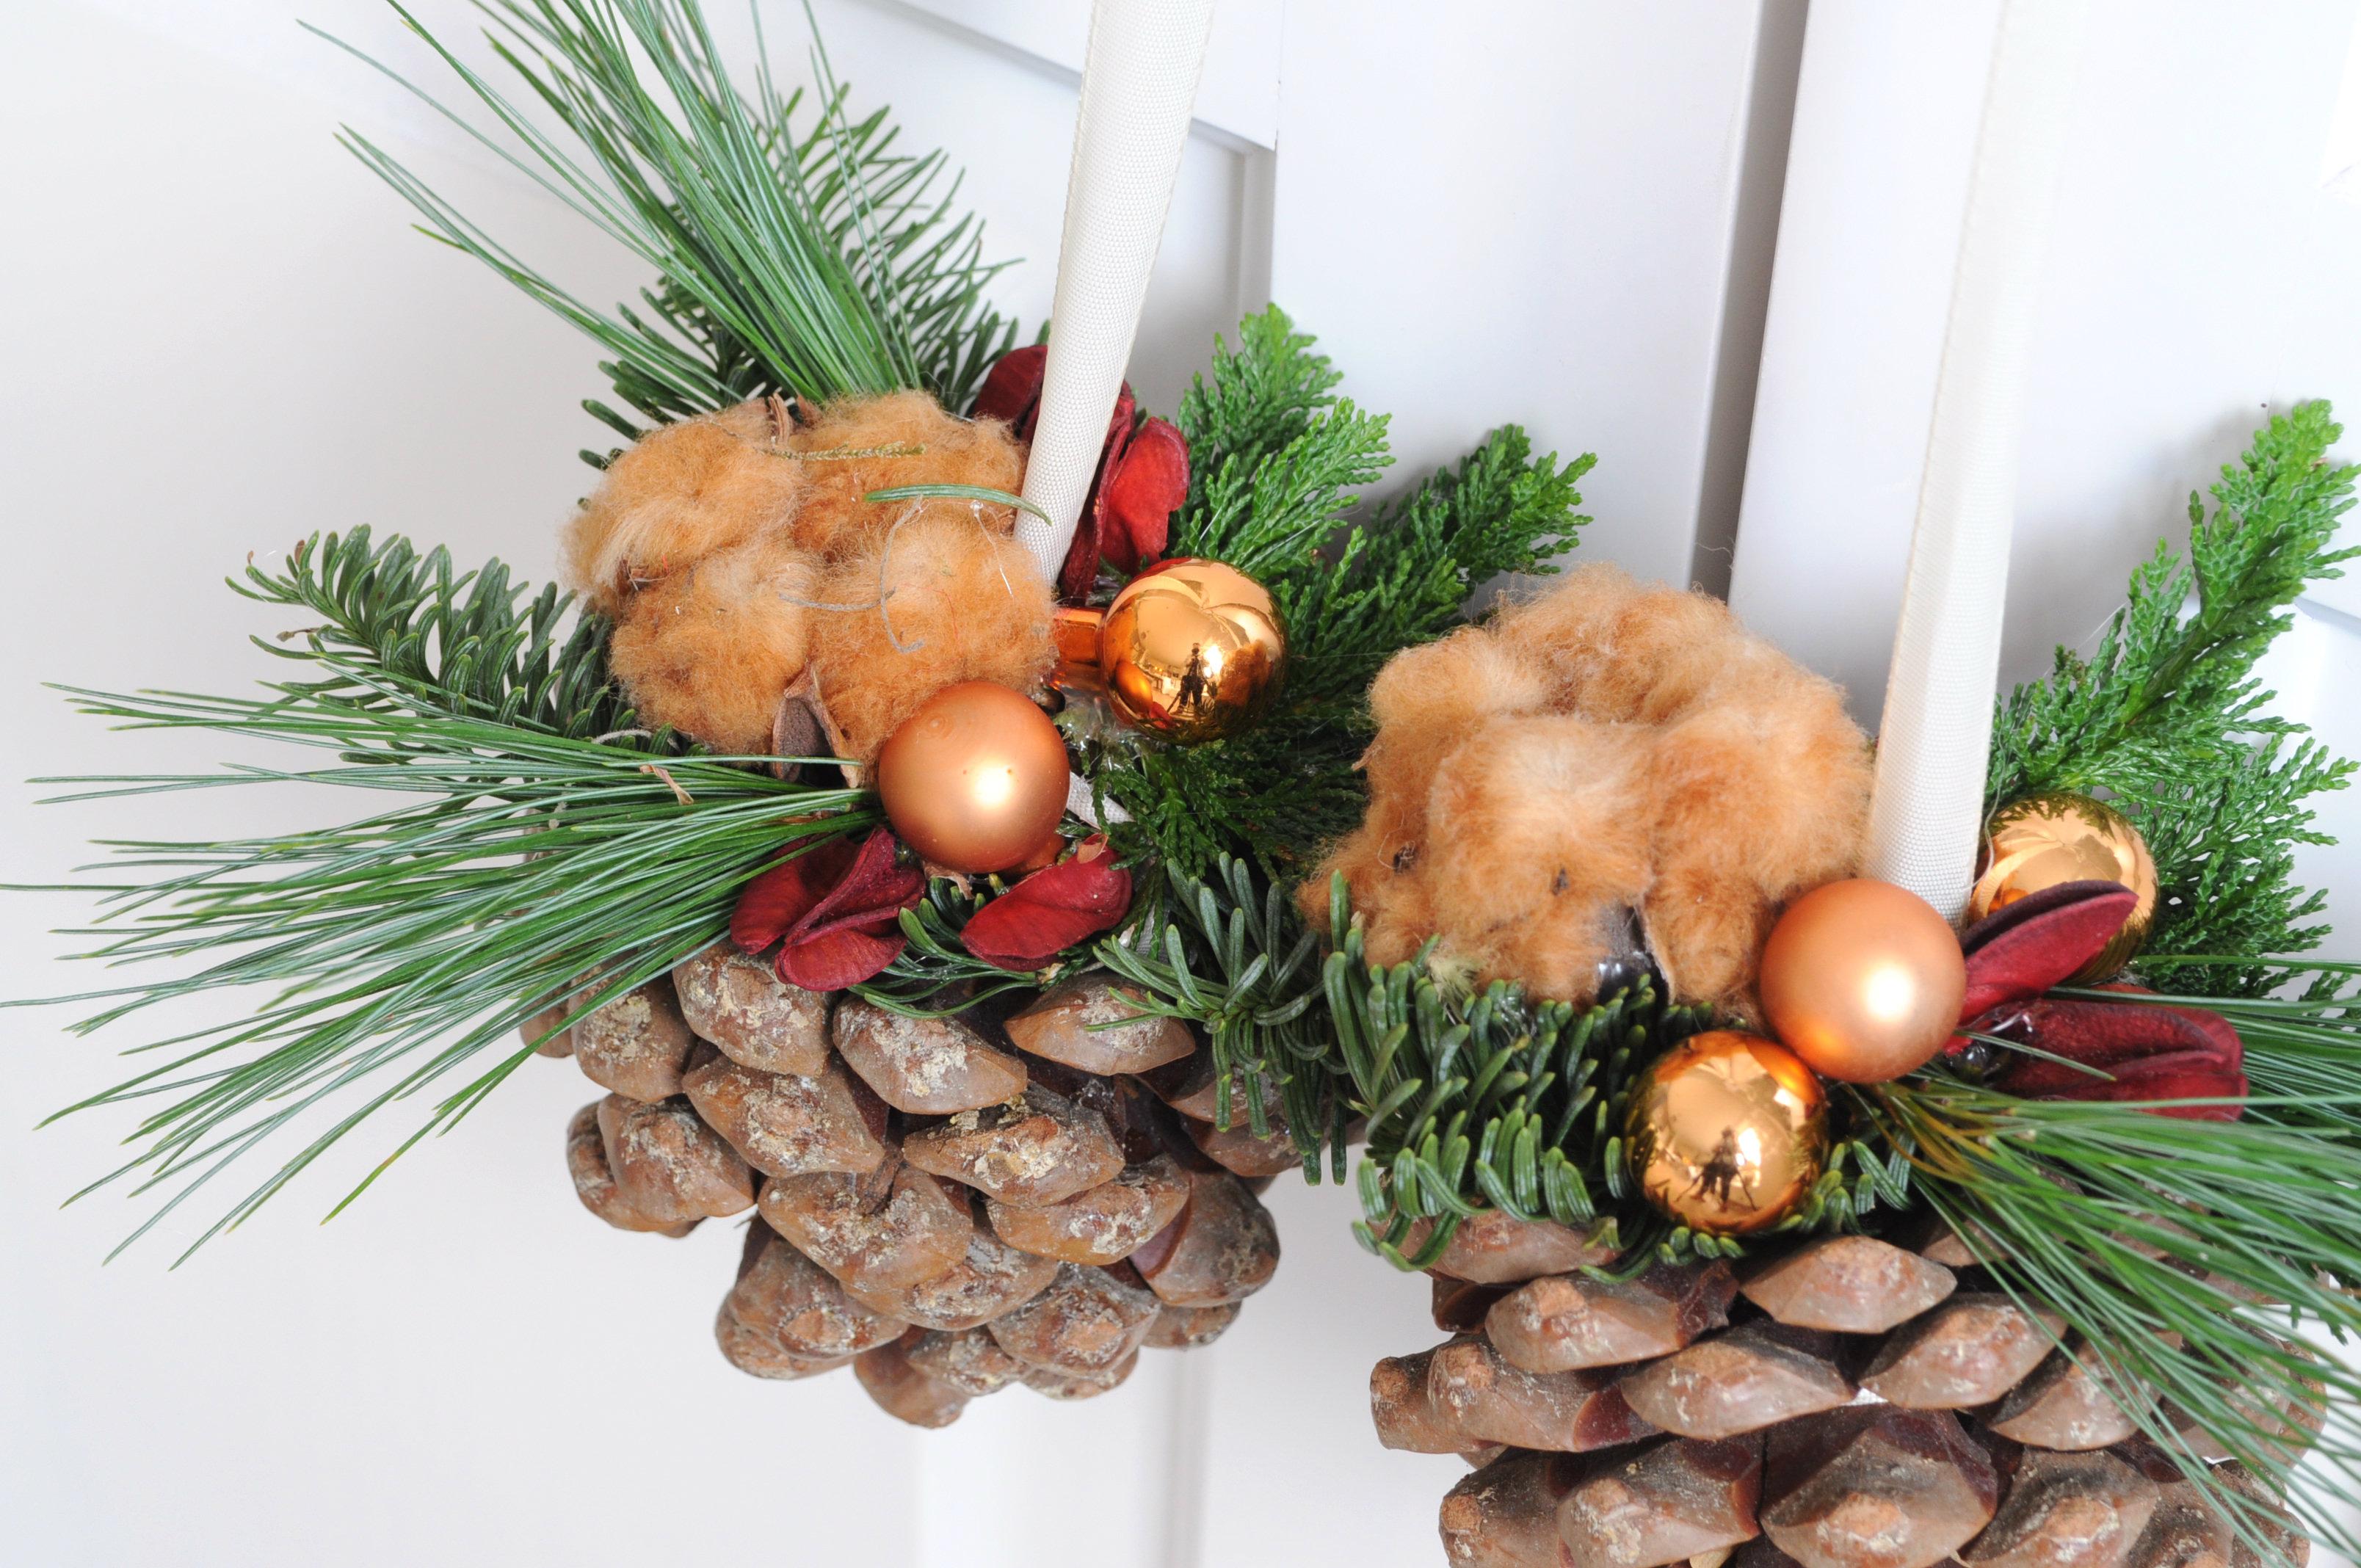 dennenappel-kerstversiering-maken